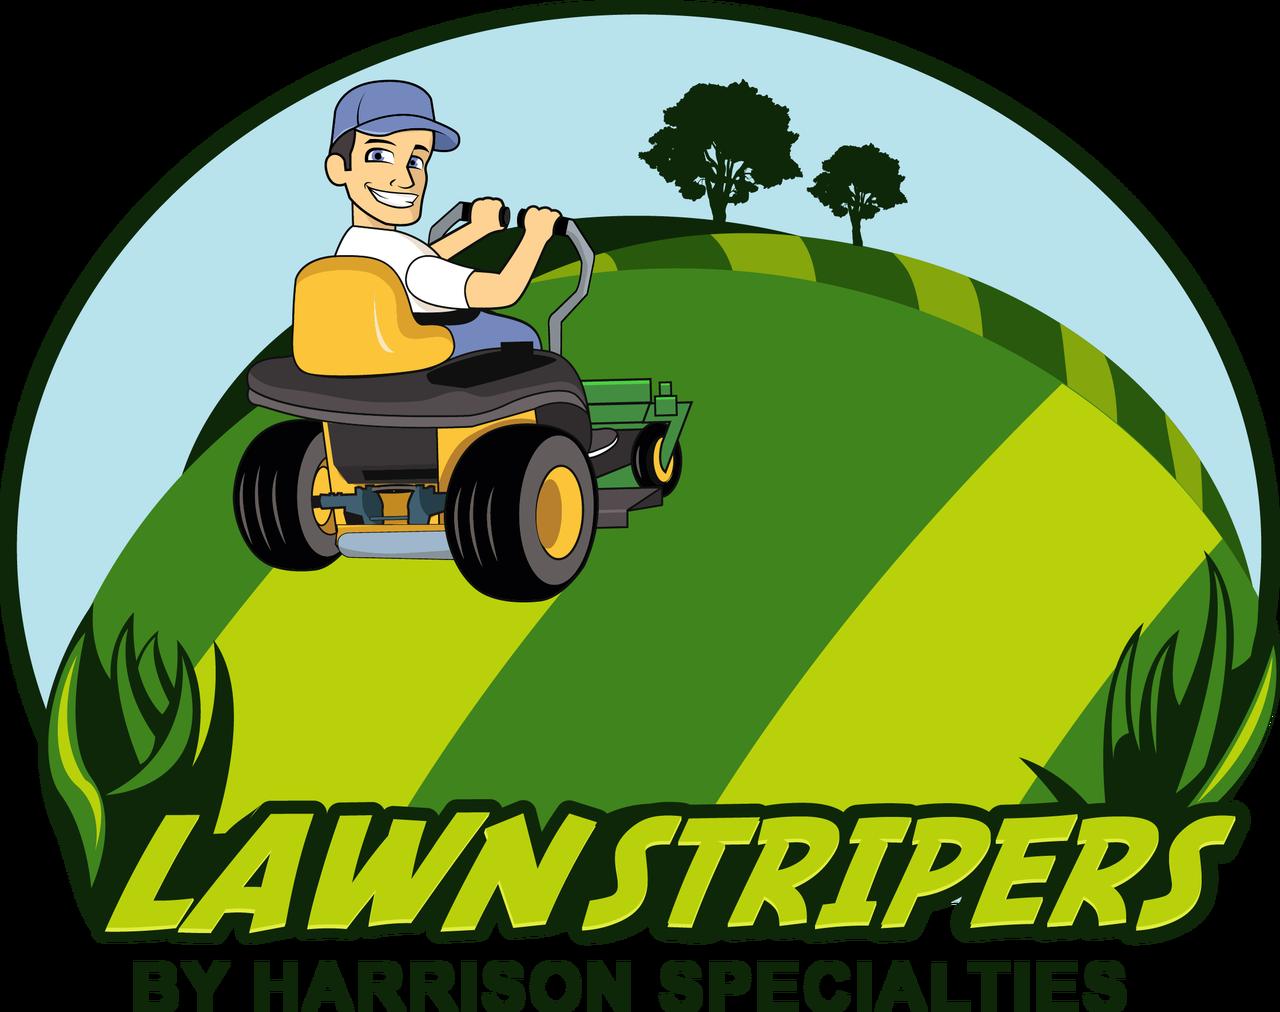 "Lawn Striping Kit for 17-21 eXmark Radius S-Series 52"" Ultra Cut Series 3 Deck"